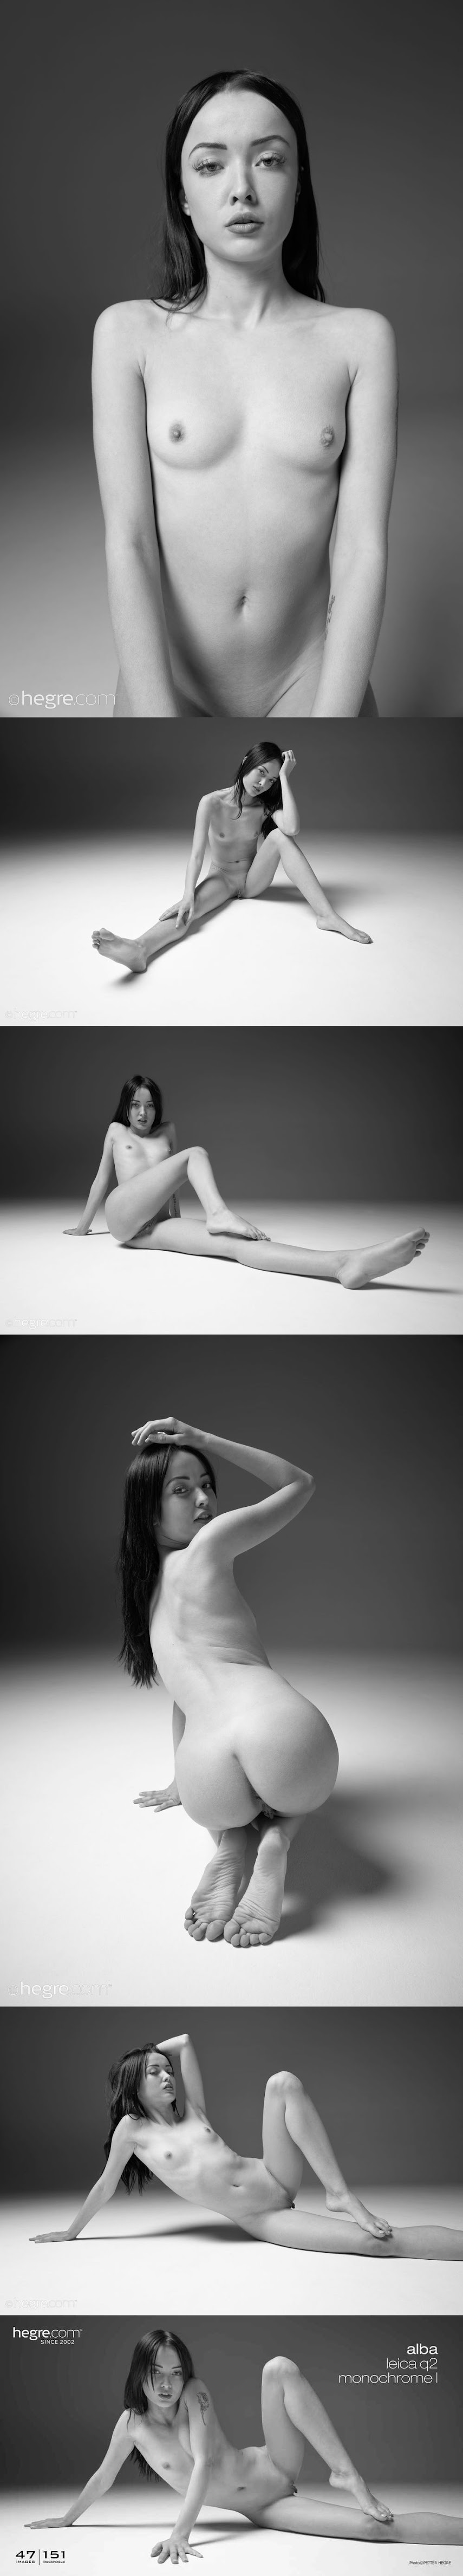 [Art] Alba - Attitude sexy girls image jav